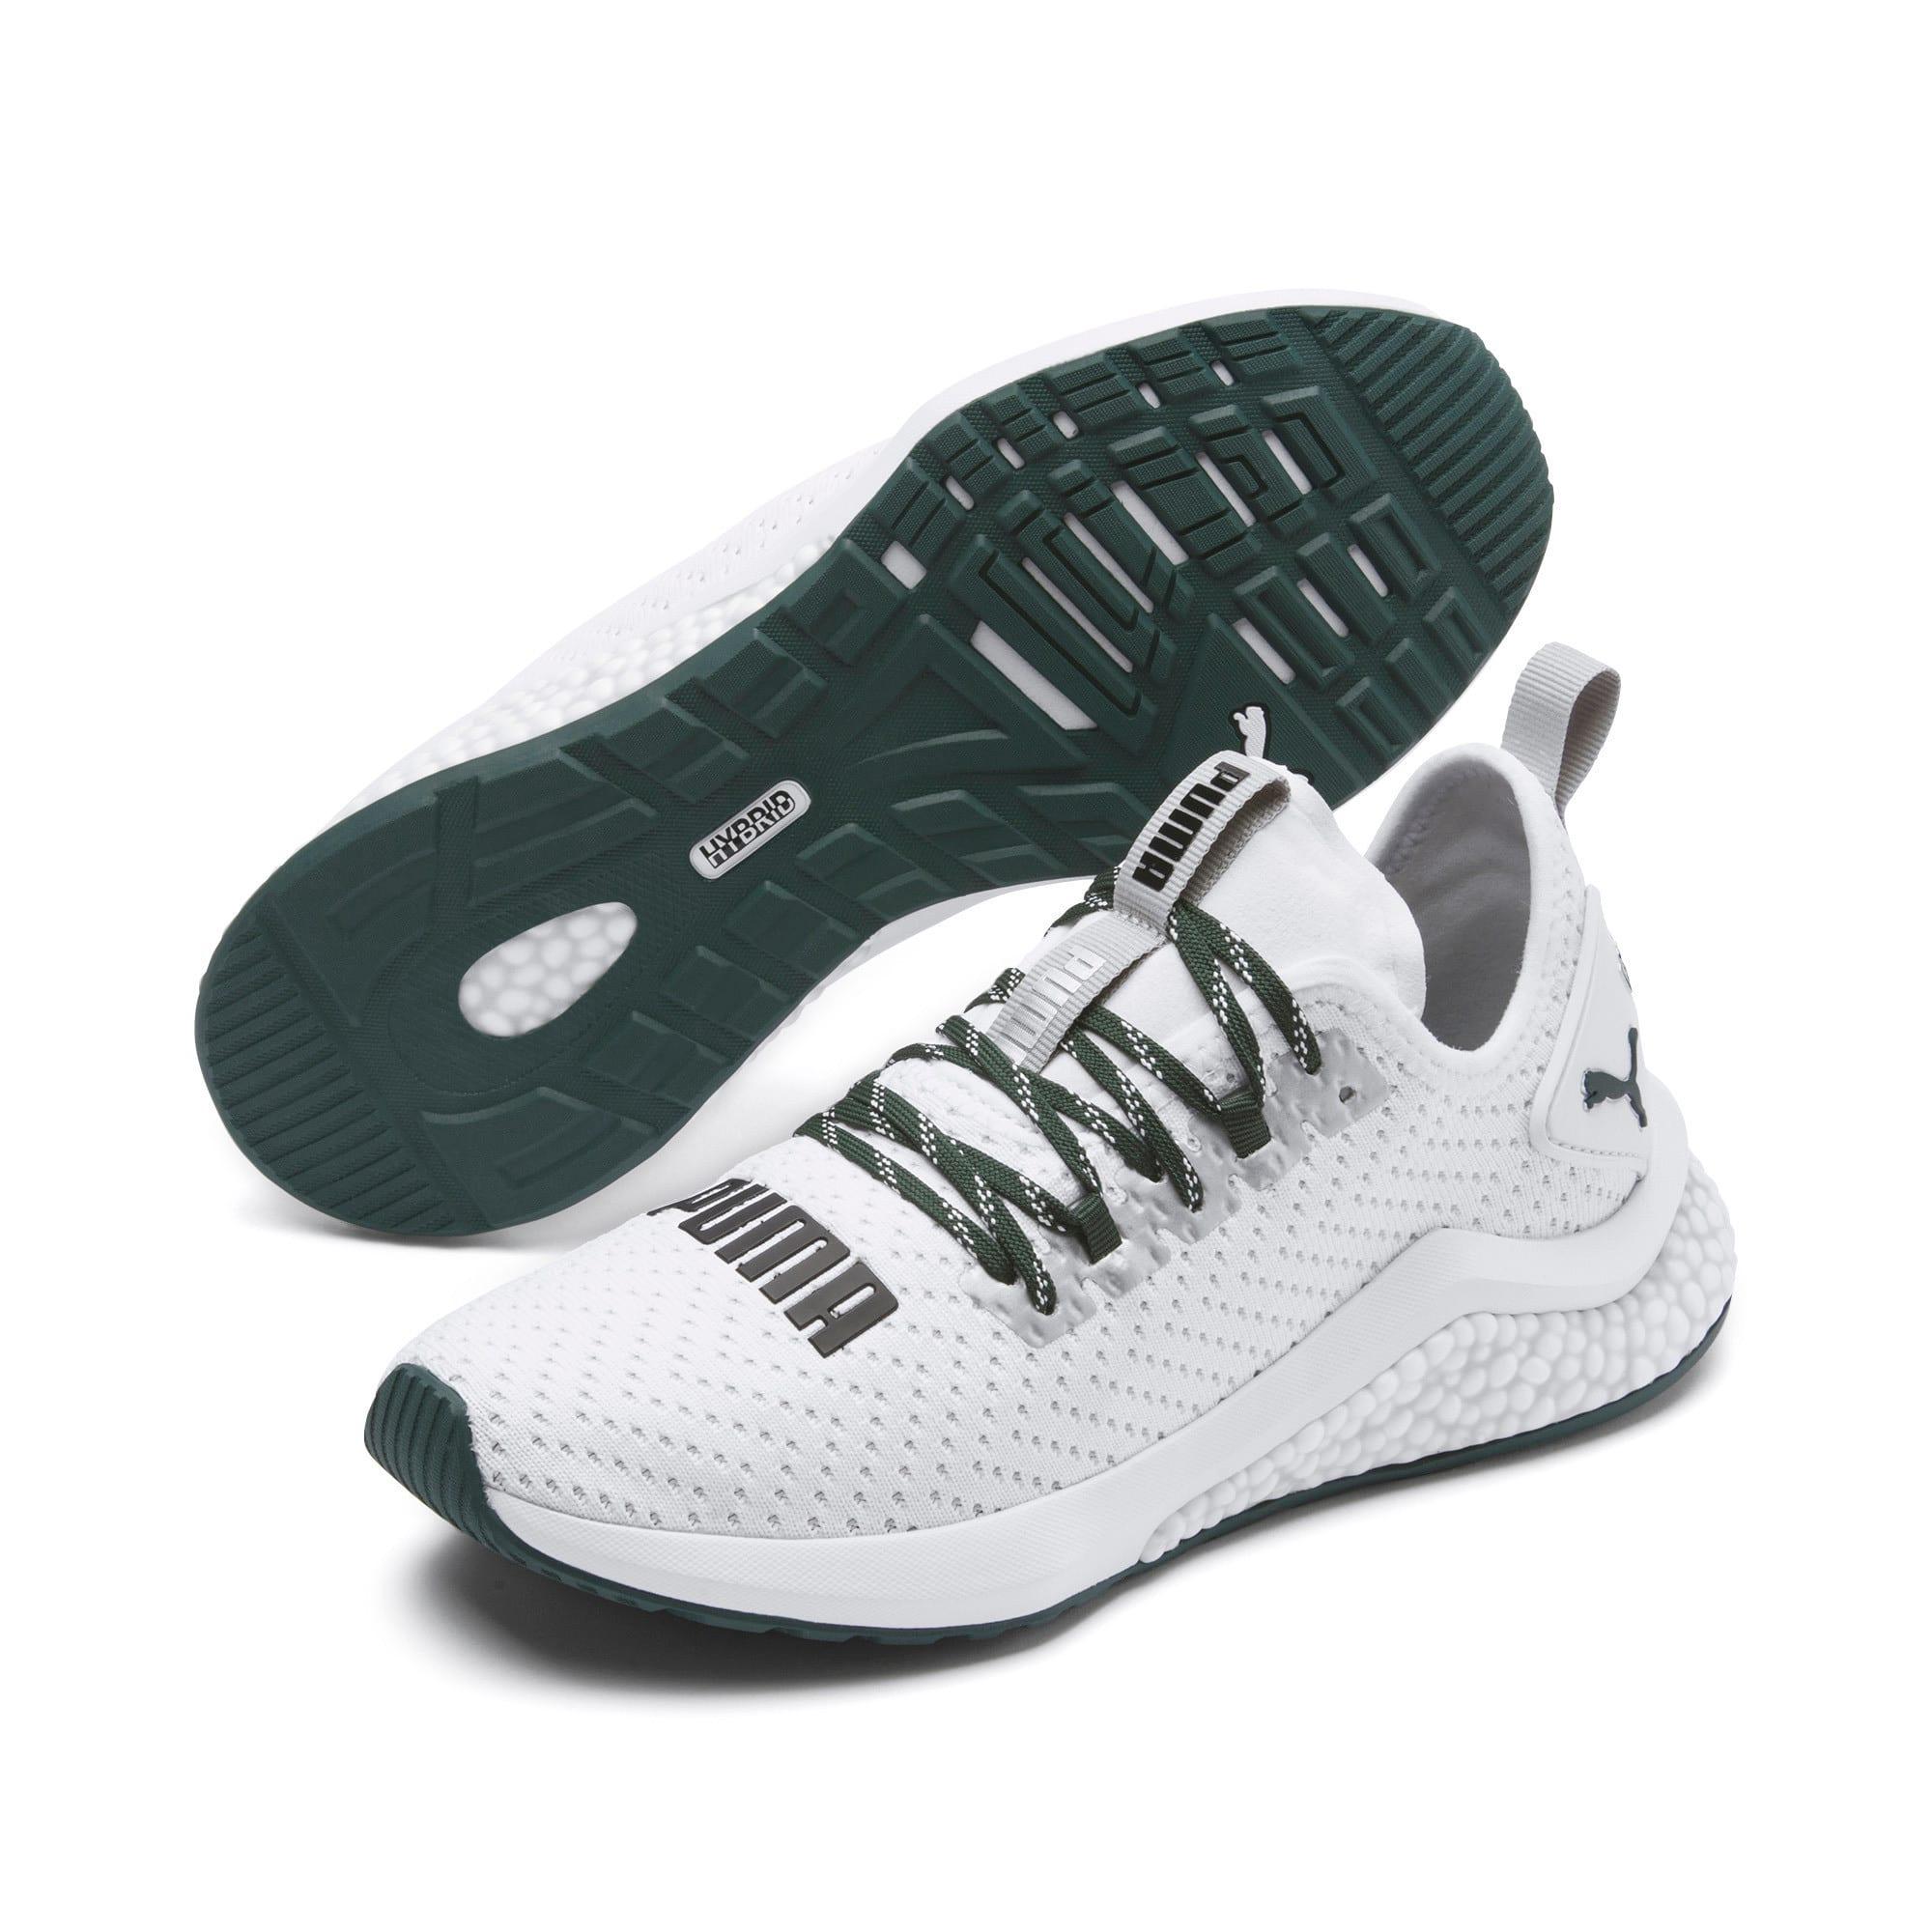 Thumbnail 3 van HYBRID NX Trailblazer hardloopschoenen voor vrouwen, Puma White-Ponderosa Pine, medium